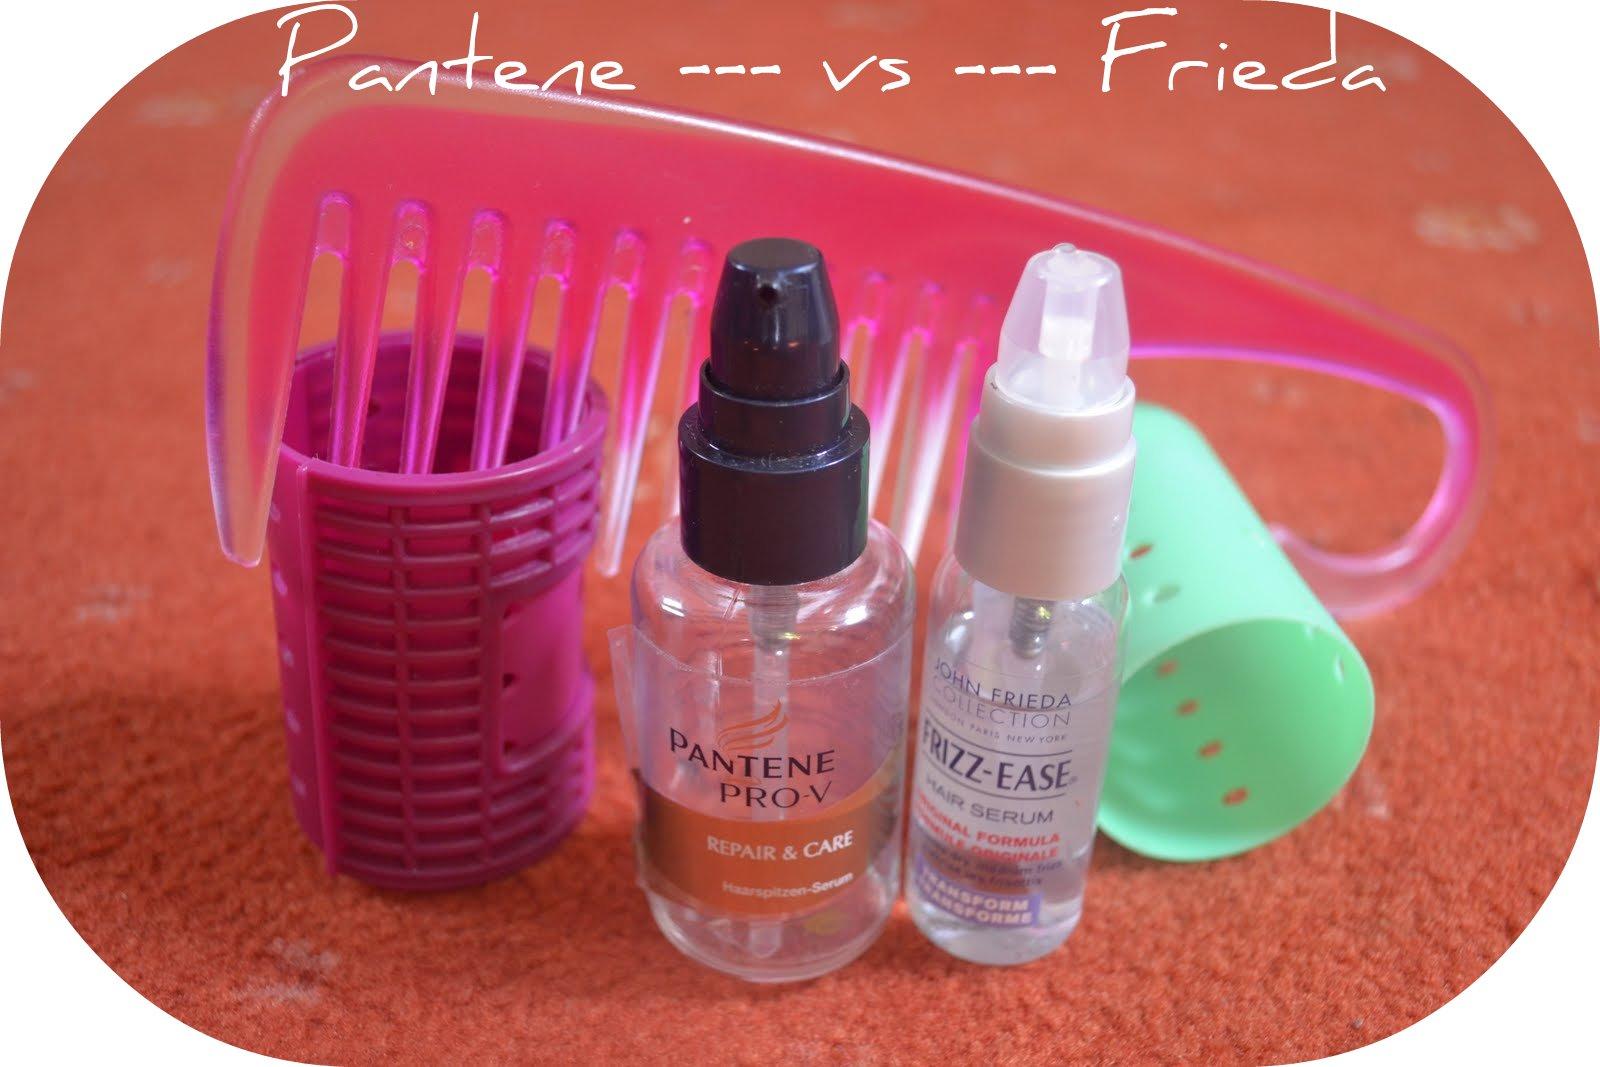 LoveYourTresses: Hair serum tug of war : Pantene vs Frieda